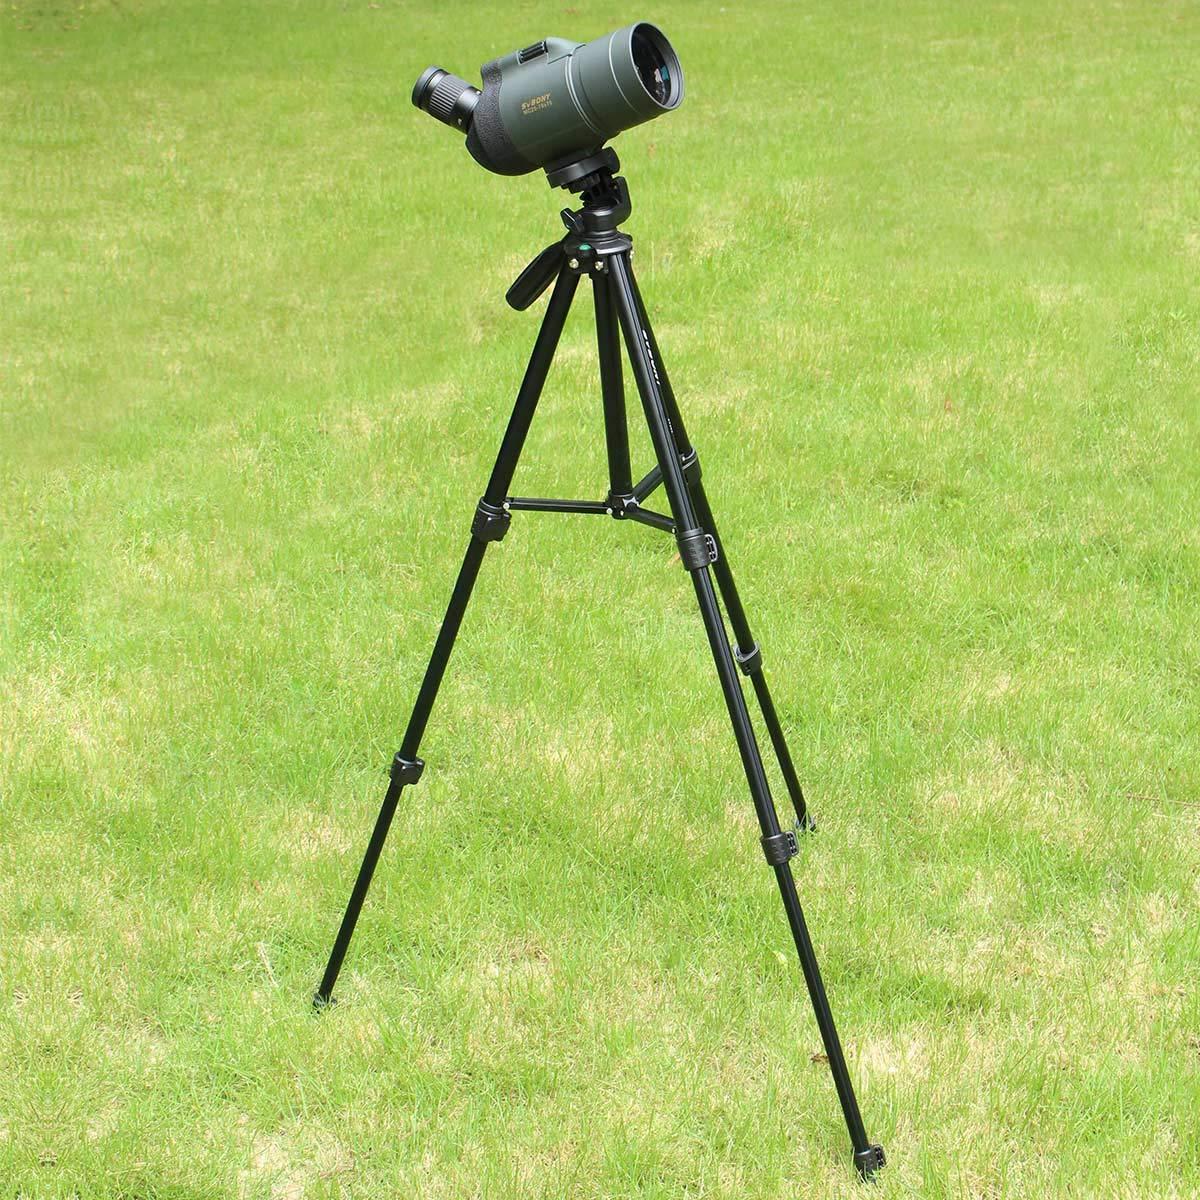 SVBONY SV41 Spotting Scope pic-4